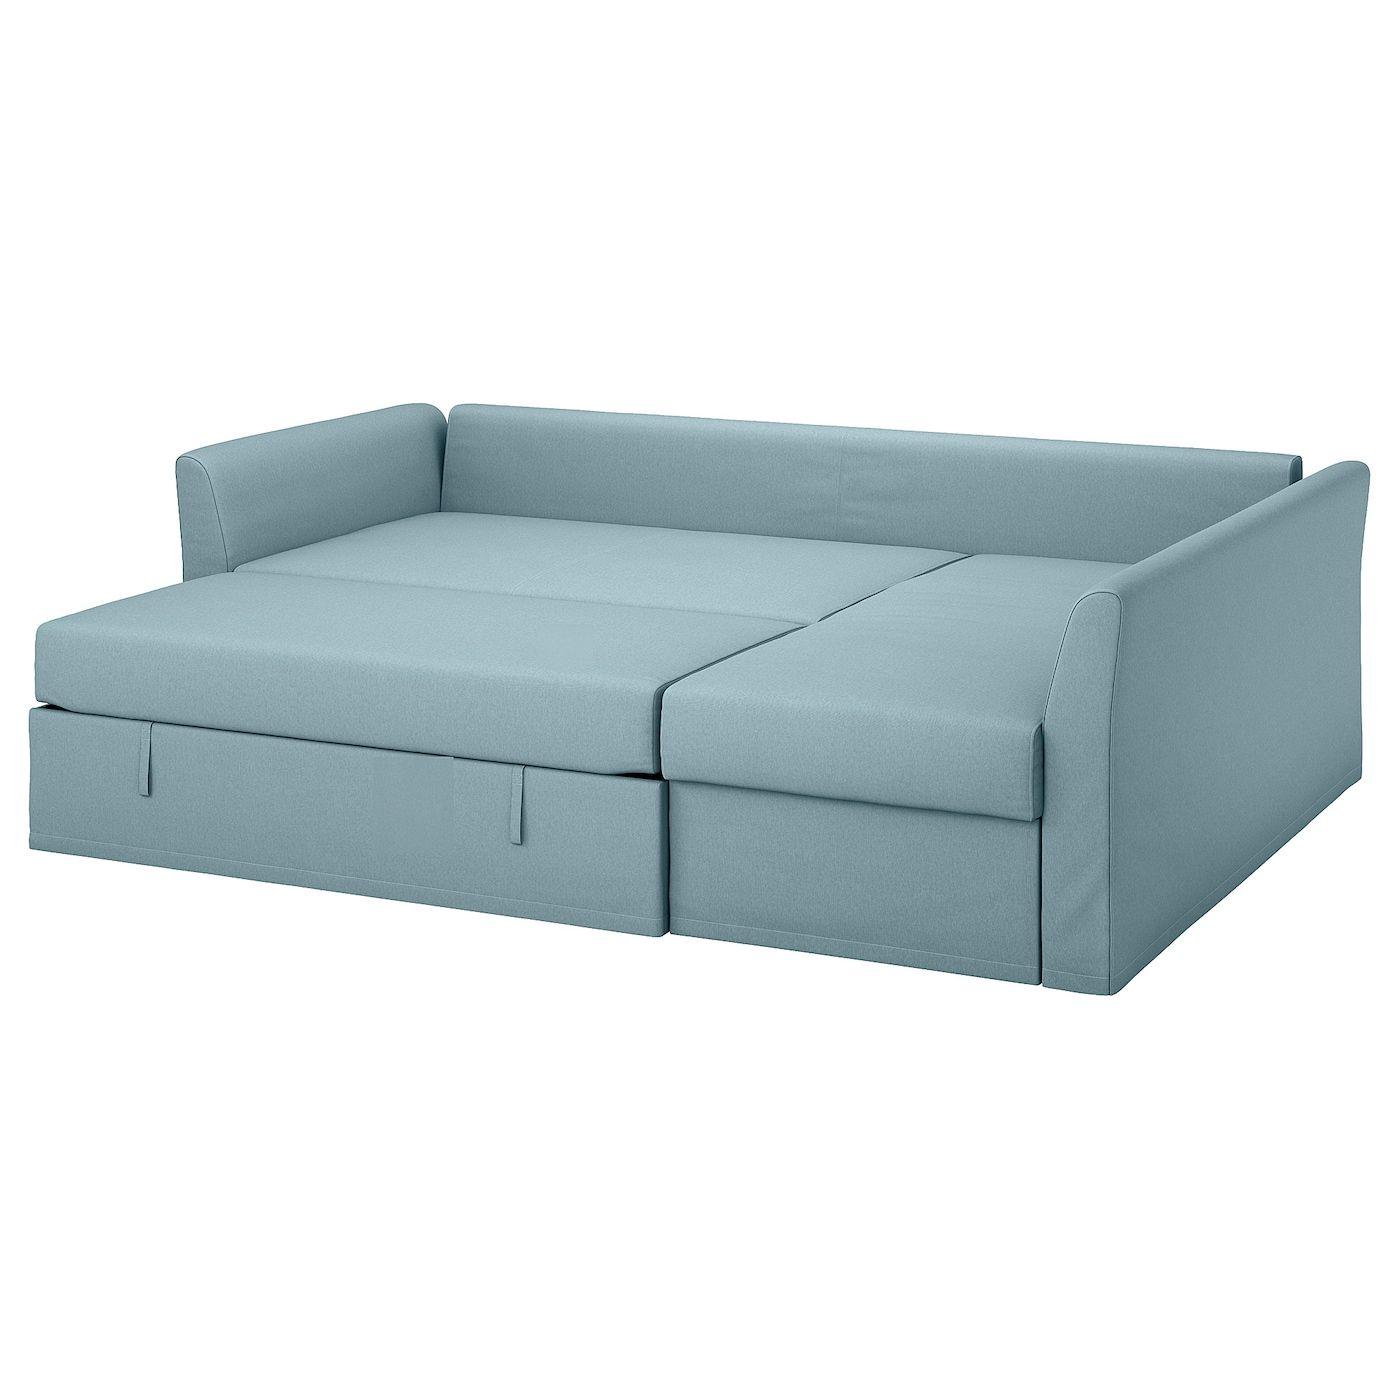 Ikea Holmsund Corner Sofa Bed Orrsta Light Blue In 2020 Sofa Bed Frame Corner Sofa Sofa